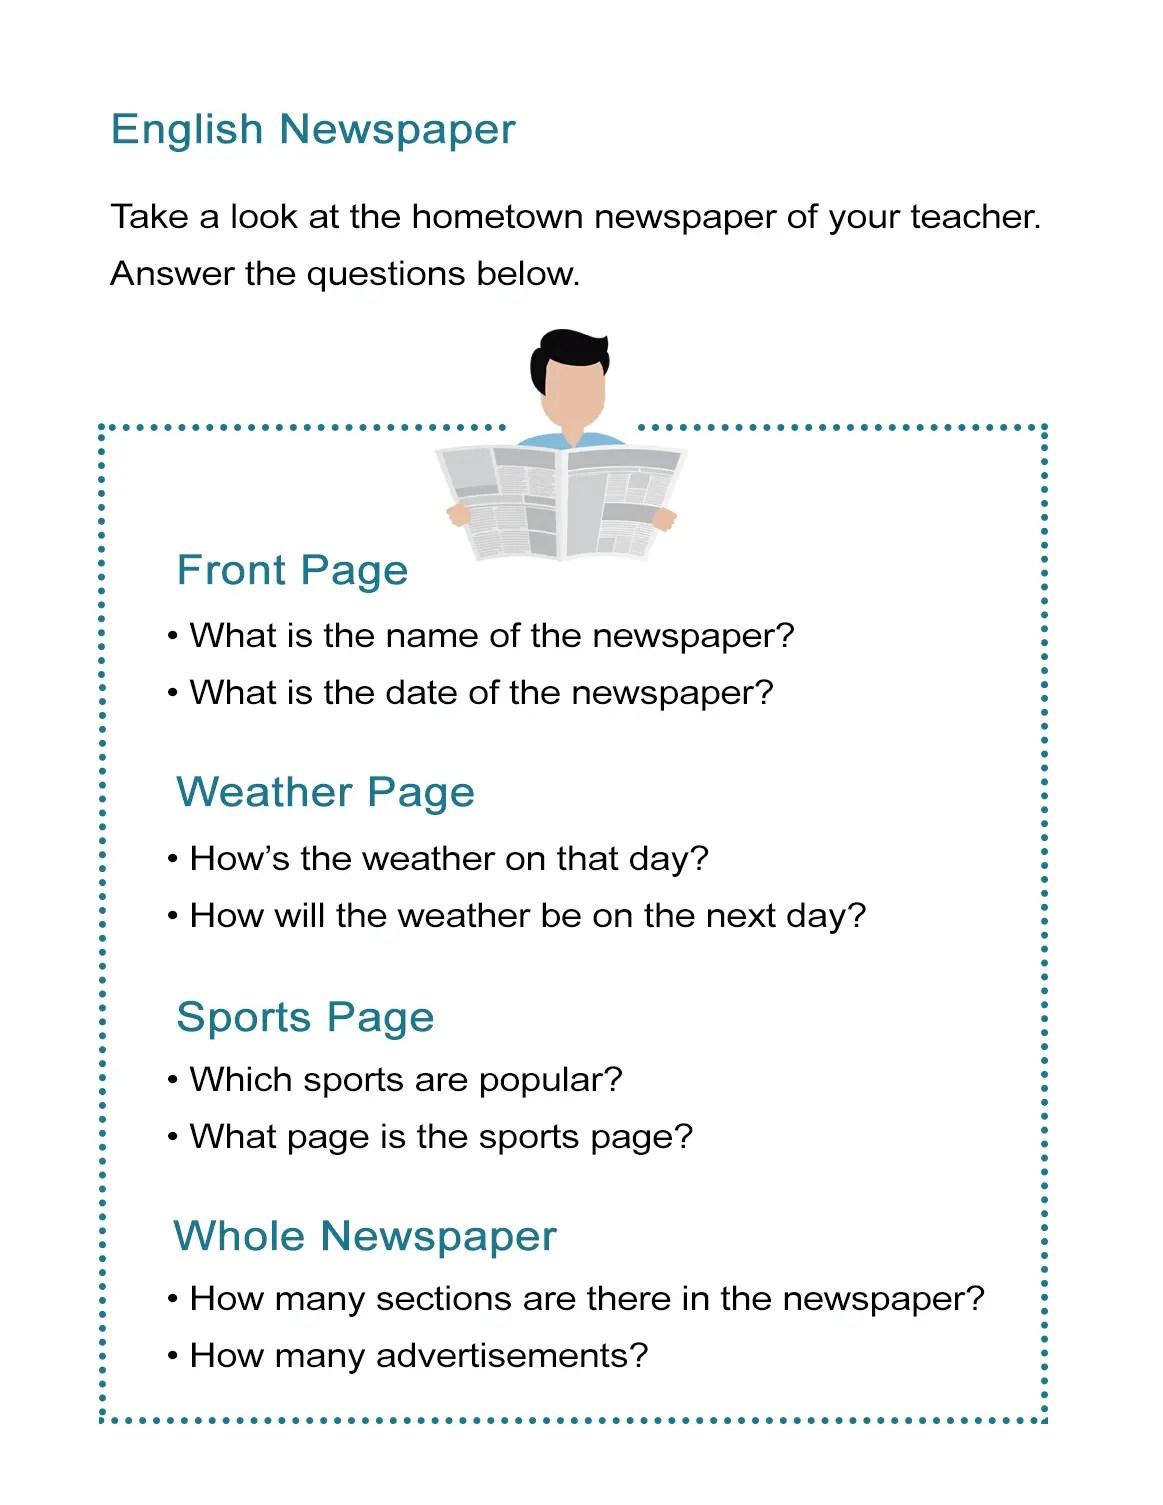 Newspaper Article Worksheet Questions